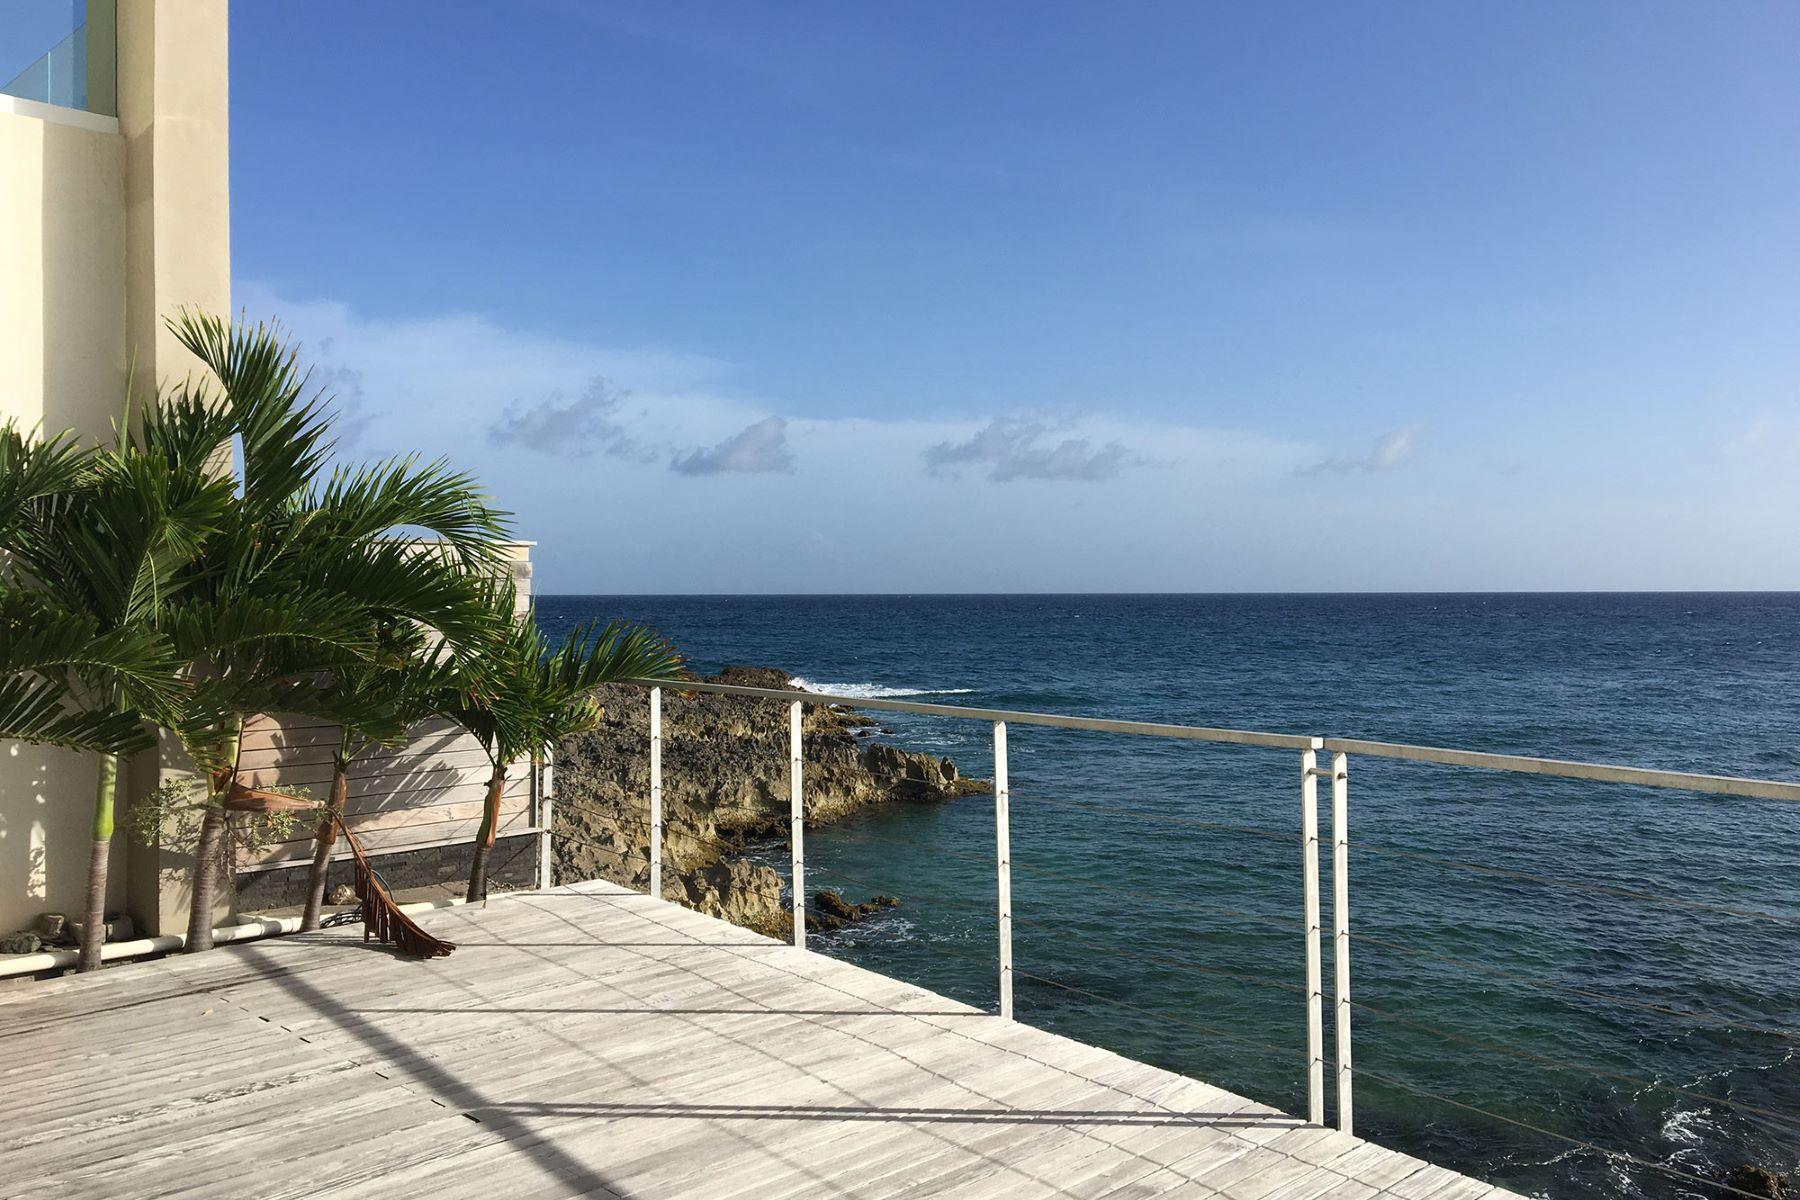 Кондоминиум для того Продажа на Ocean's Edge - Serenity Beacon Hill, St. Maarten